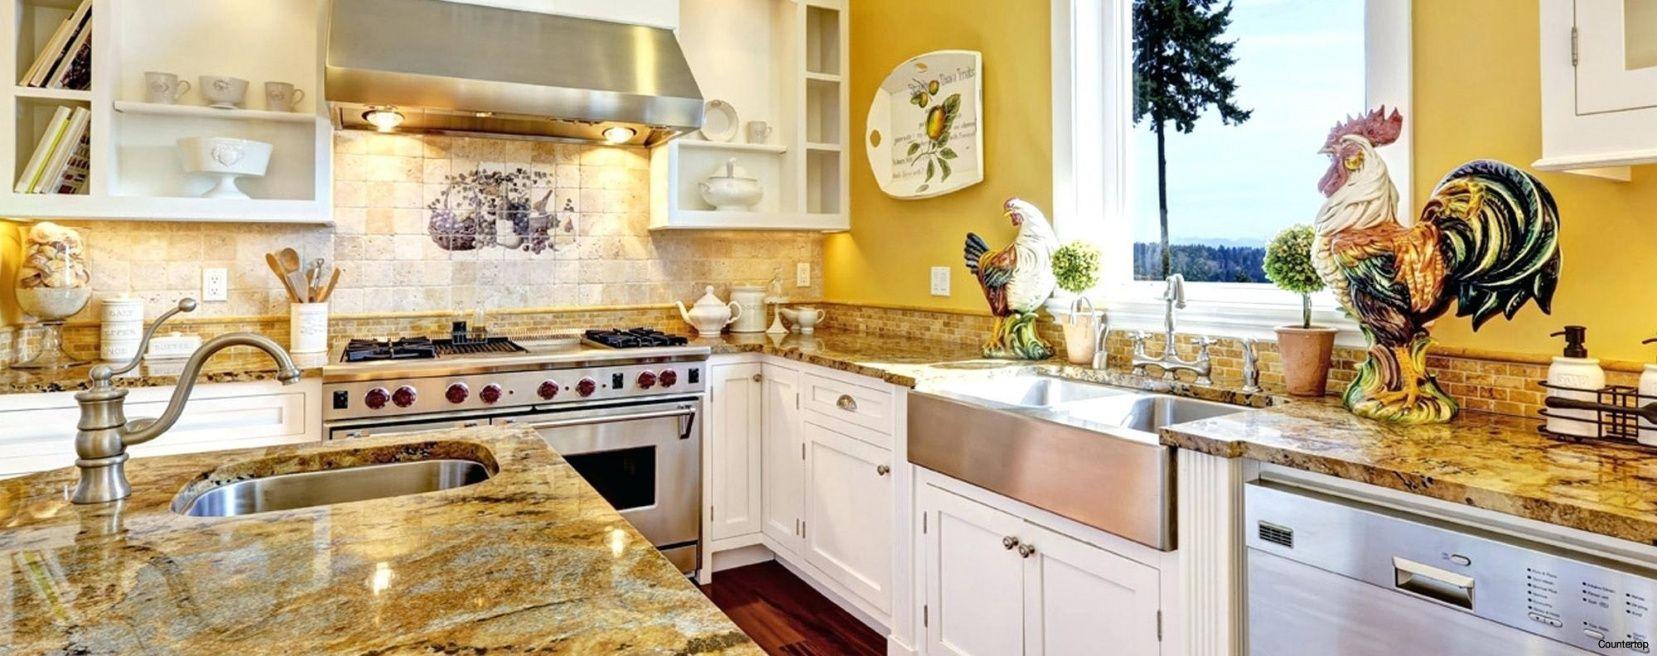 50+ granite countertops hagerstown md - kitchen cabinets update